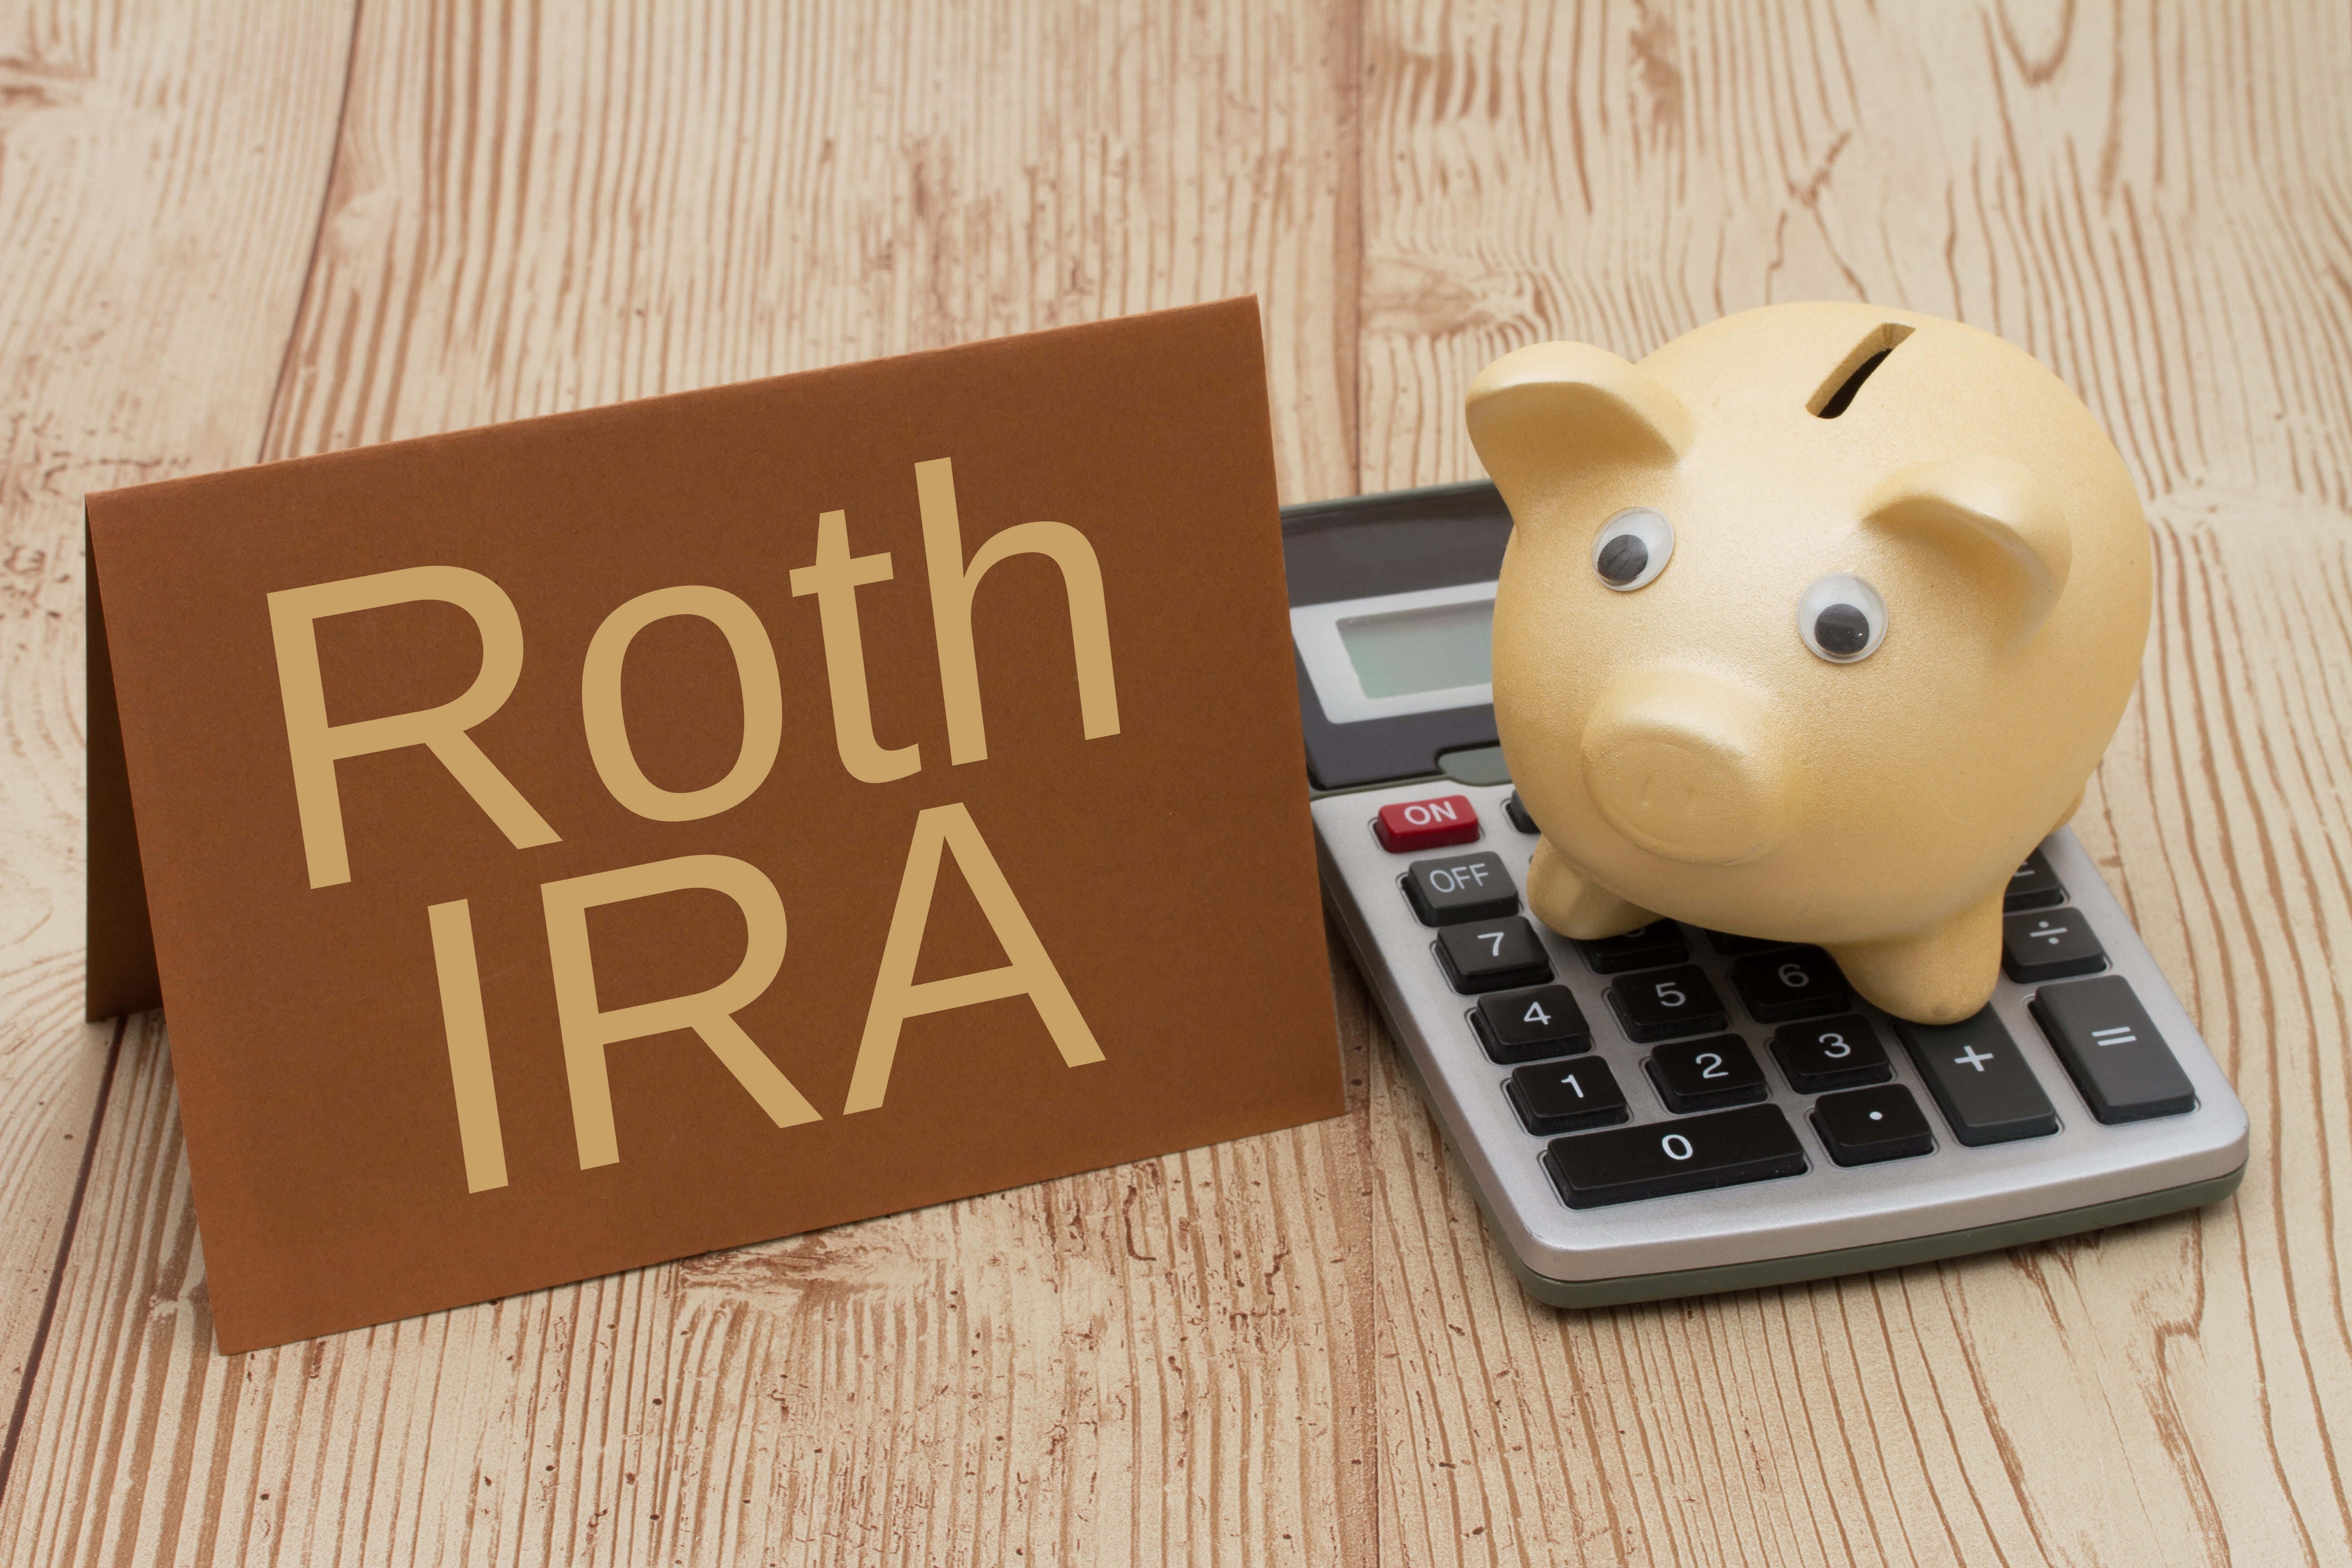 roth IRA plan card next to piggy bank on calculator